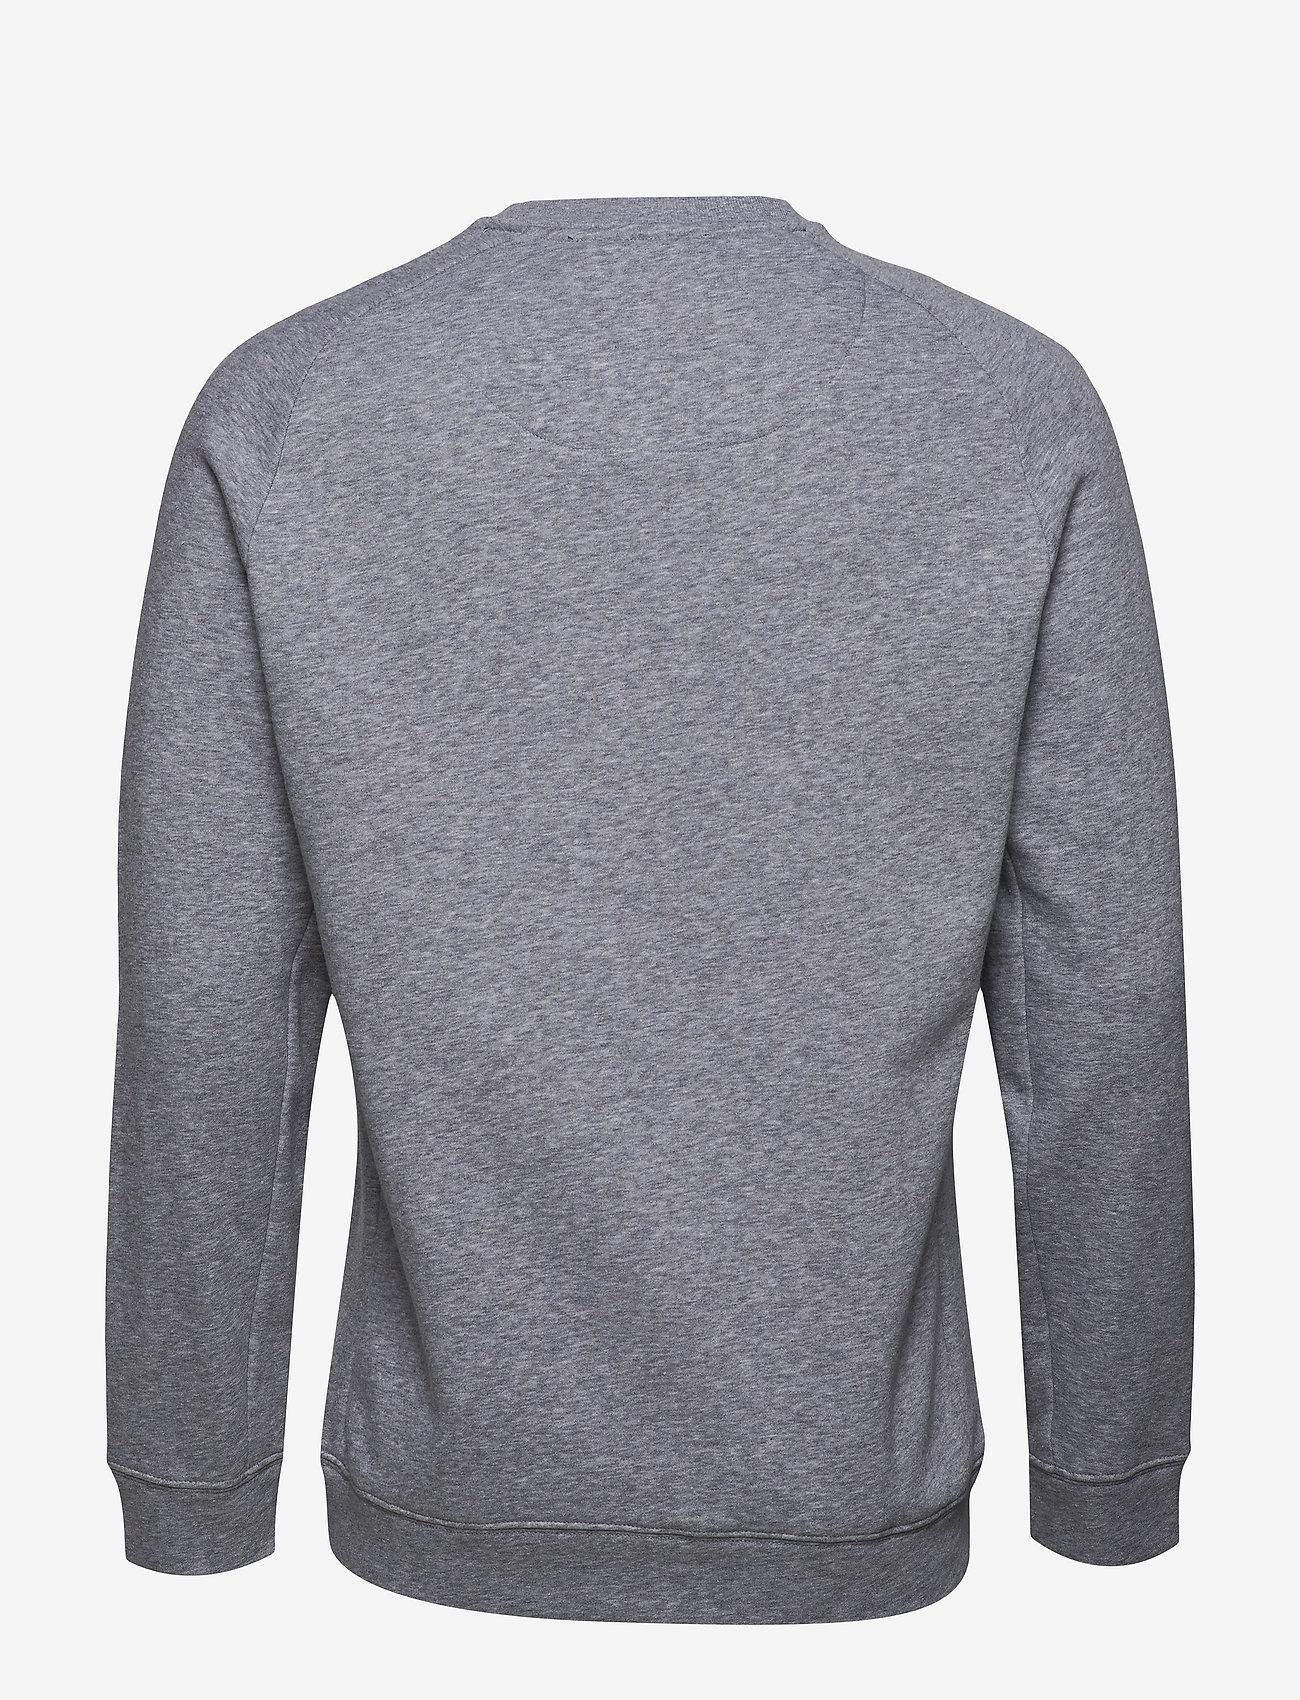 Björn Borg - CREW BBCENTRE BBCENTRE - sweatshirts - h108by light grey melange - 1